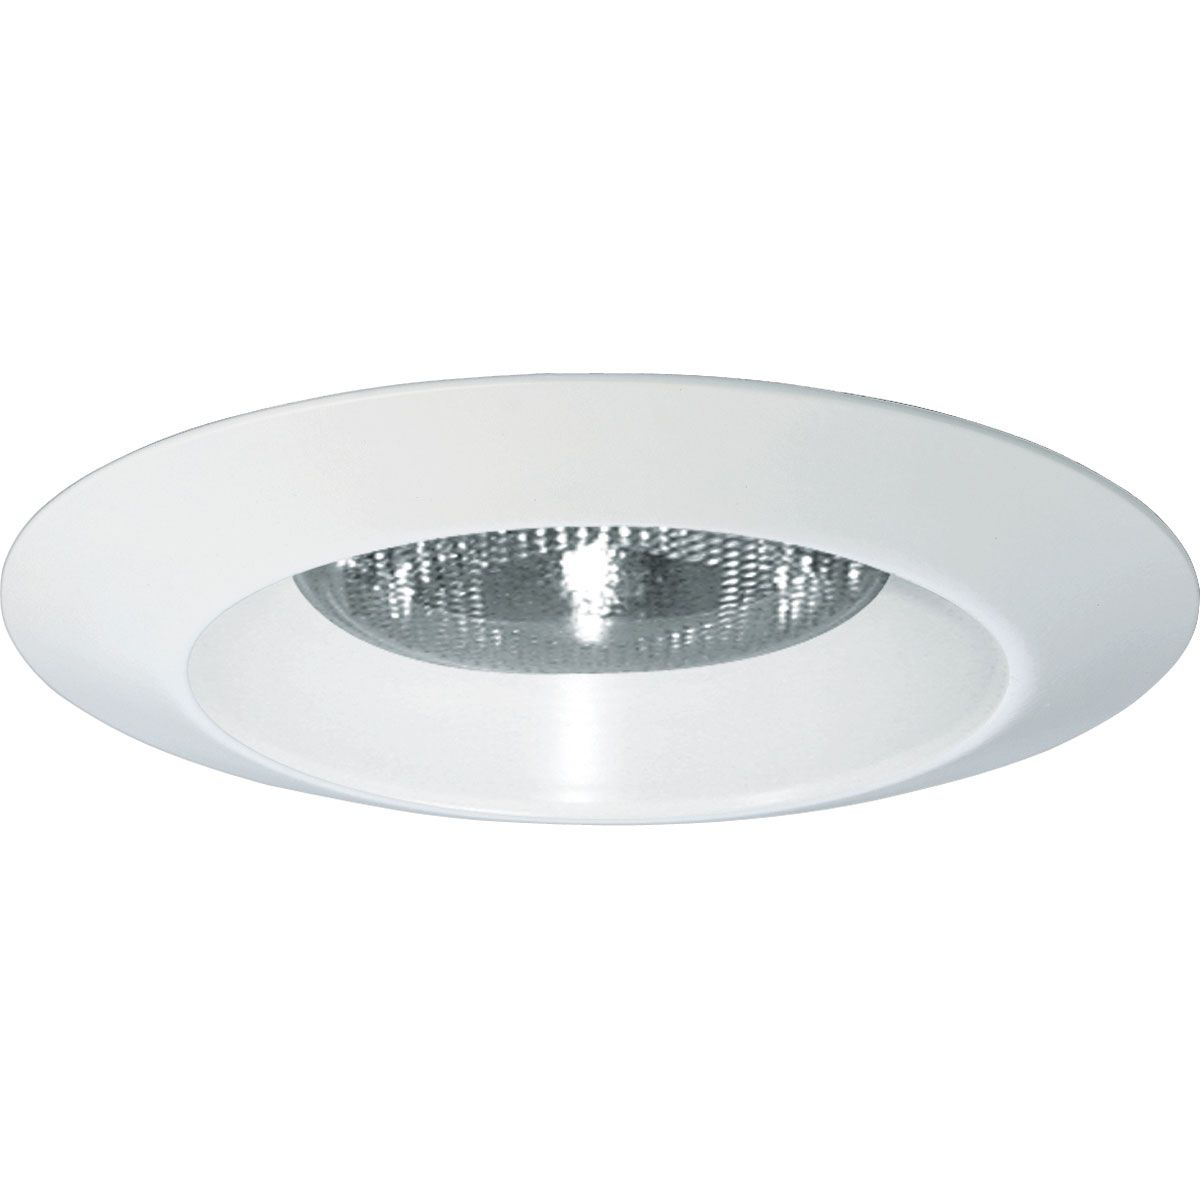 PROP8074WL-28 OPEN SHOWER TRIM WITH FLANGE; METAL FLANGE; WHITE; 6 INCH NOMINAL APERTURE SIZE; ROUND APERTURE SHAPE; PAR38 75 W INCANDESCENT LAMP; SIZE 8-3/4 INCH; APPLICATION DAMP/WET LOCATION; USED ON P87-AT/P187-TG SERIES, PROGRESS